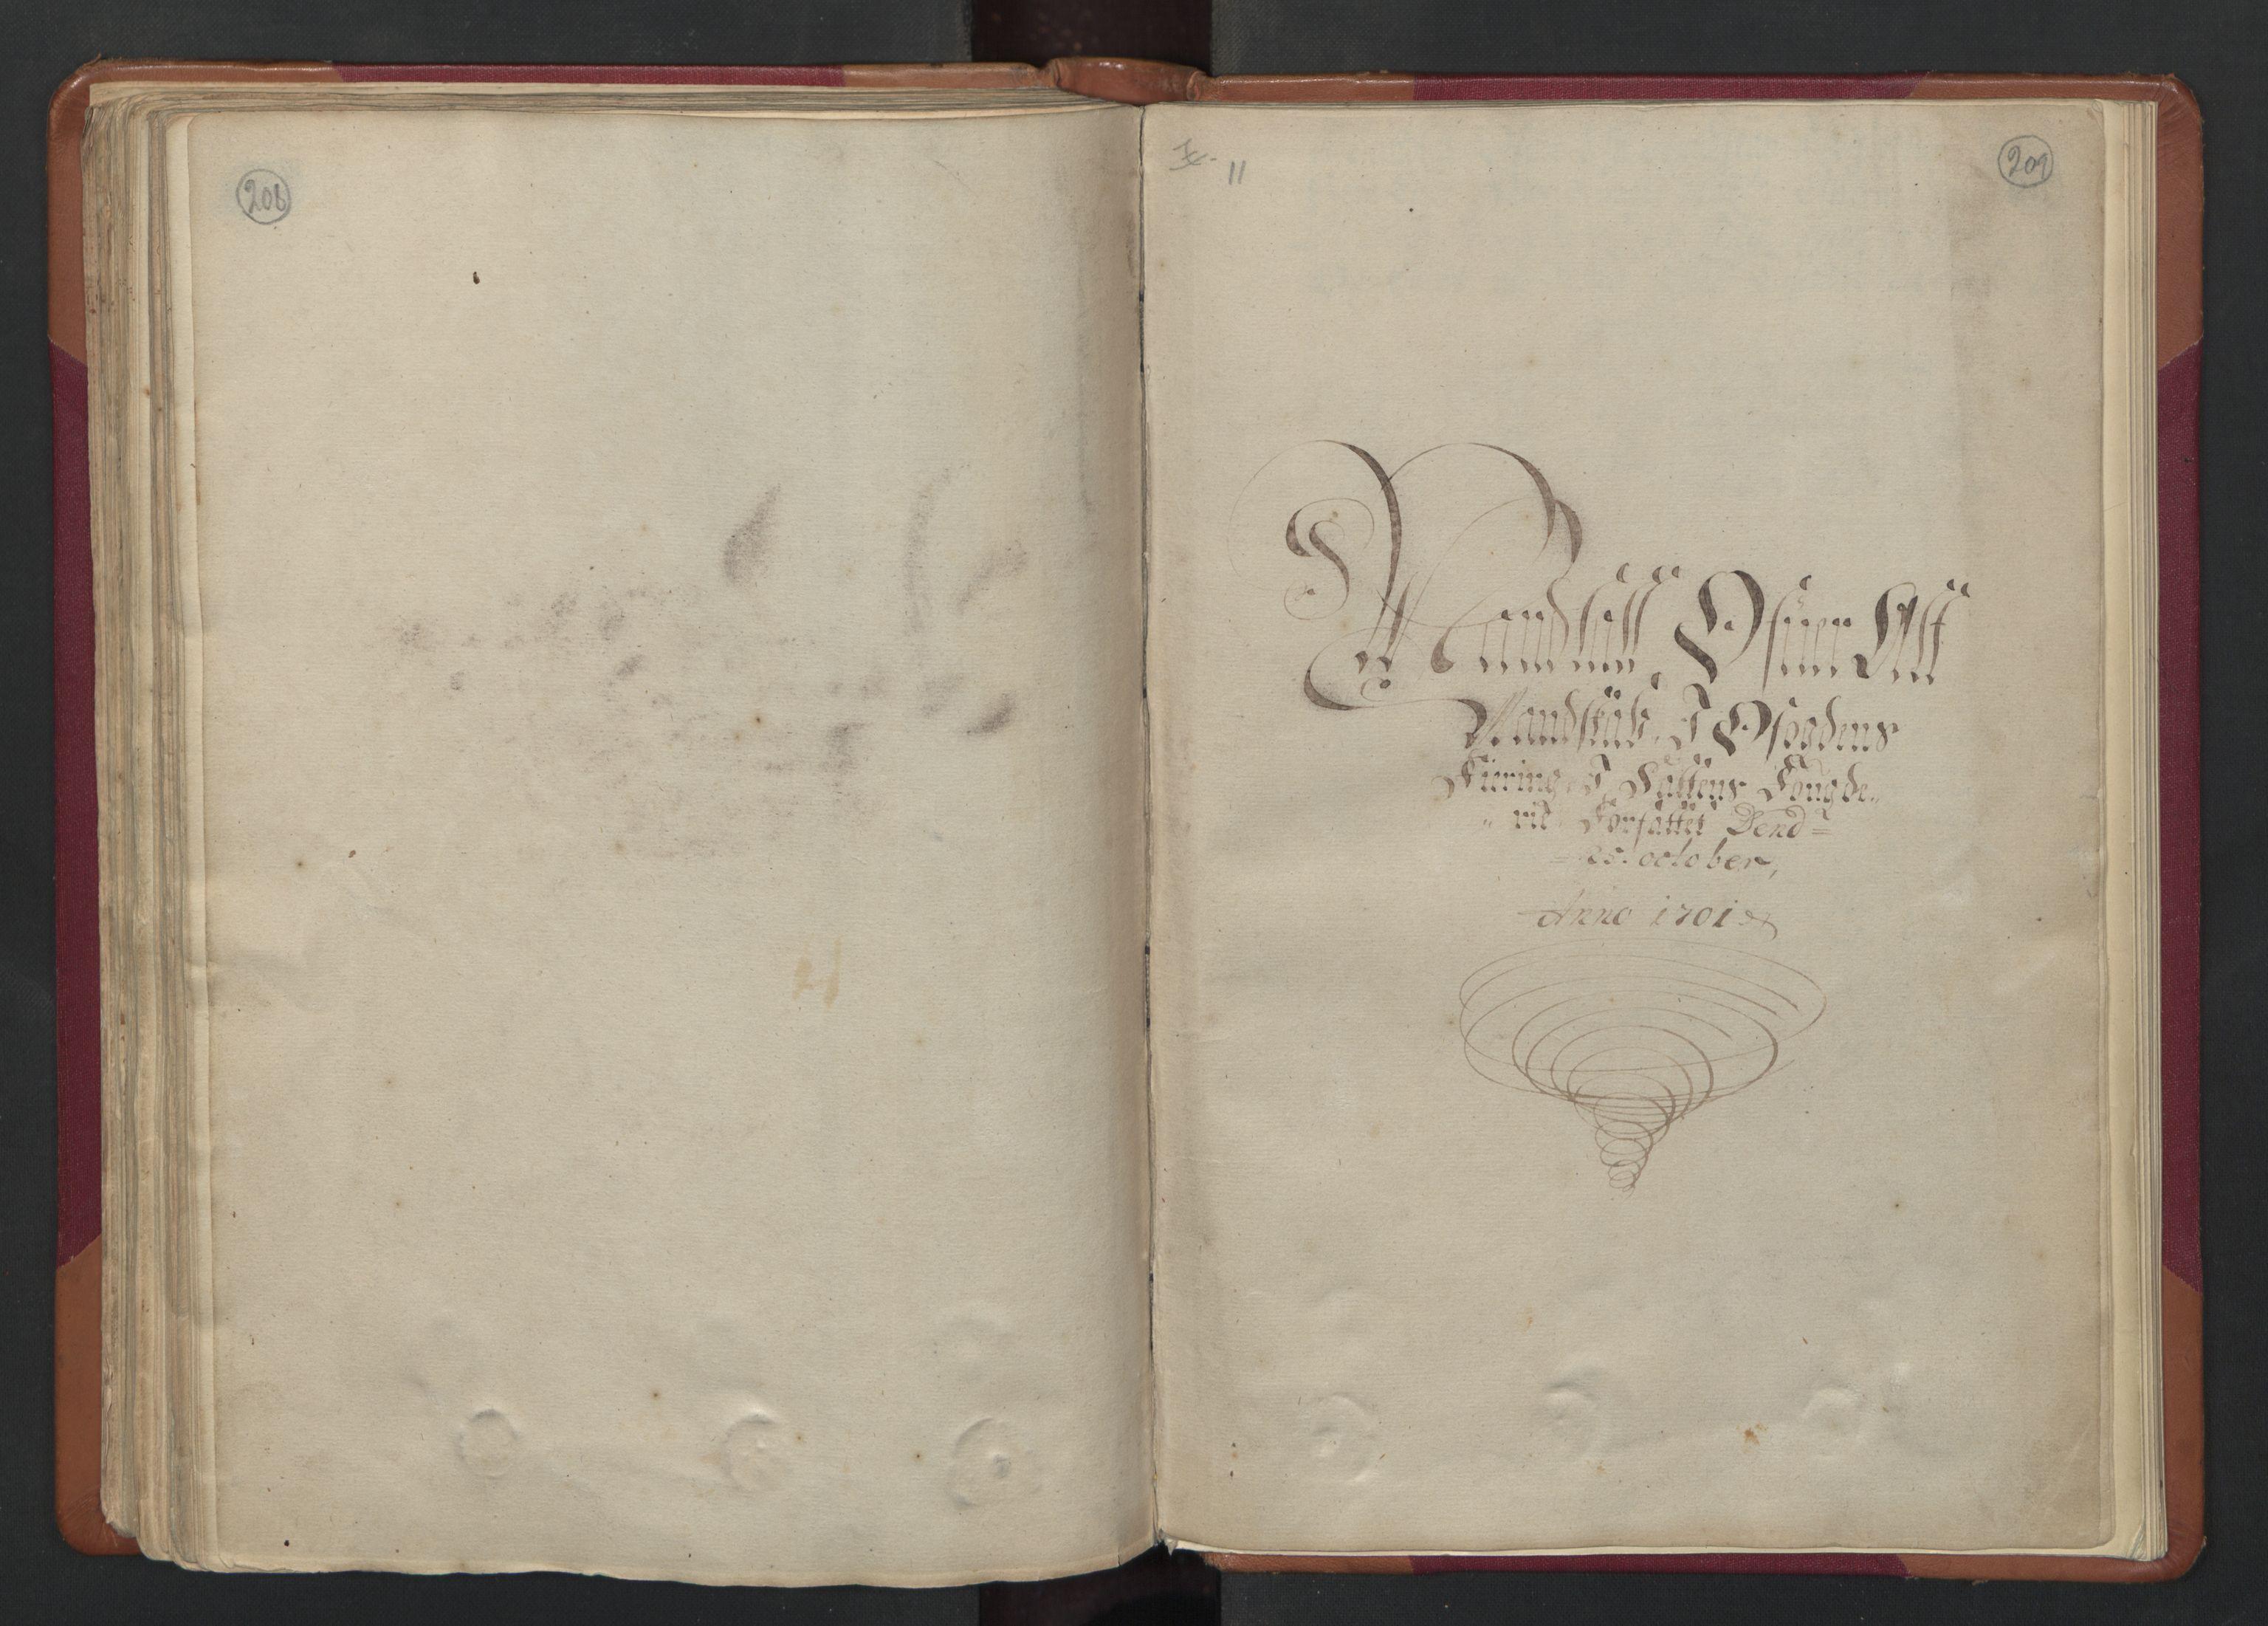 RA, Manntallet 1701, nr. 17: Salten fogderi, 1701, s. 208-209